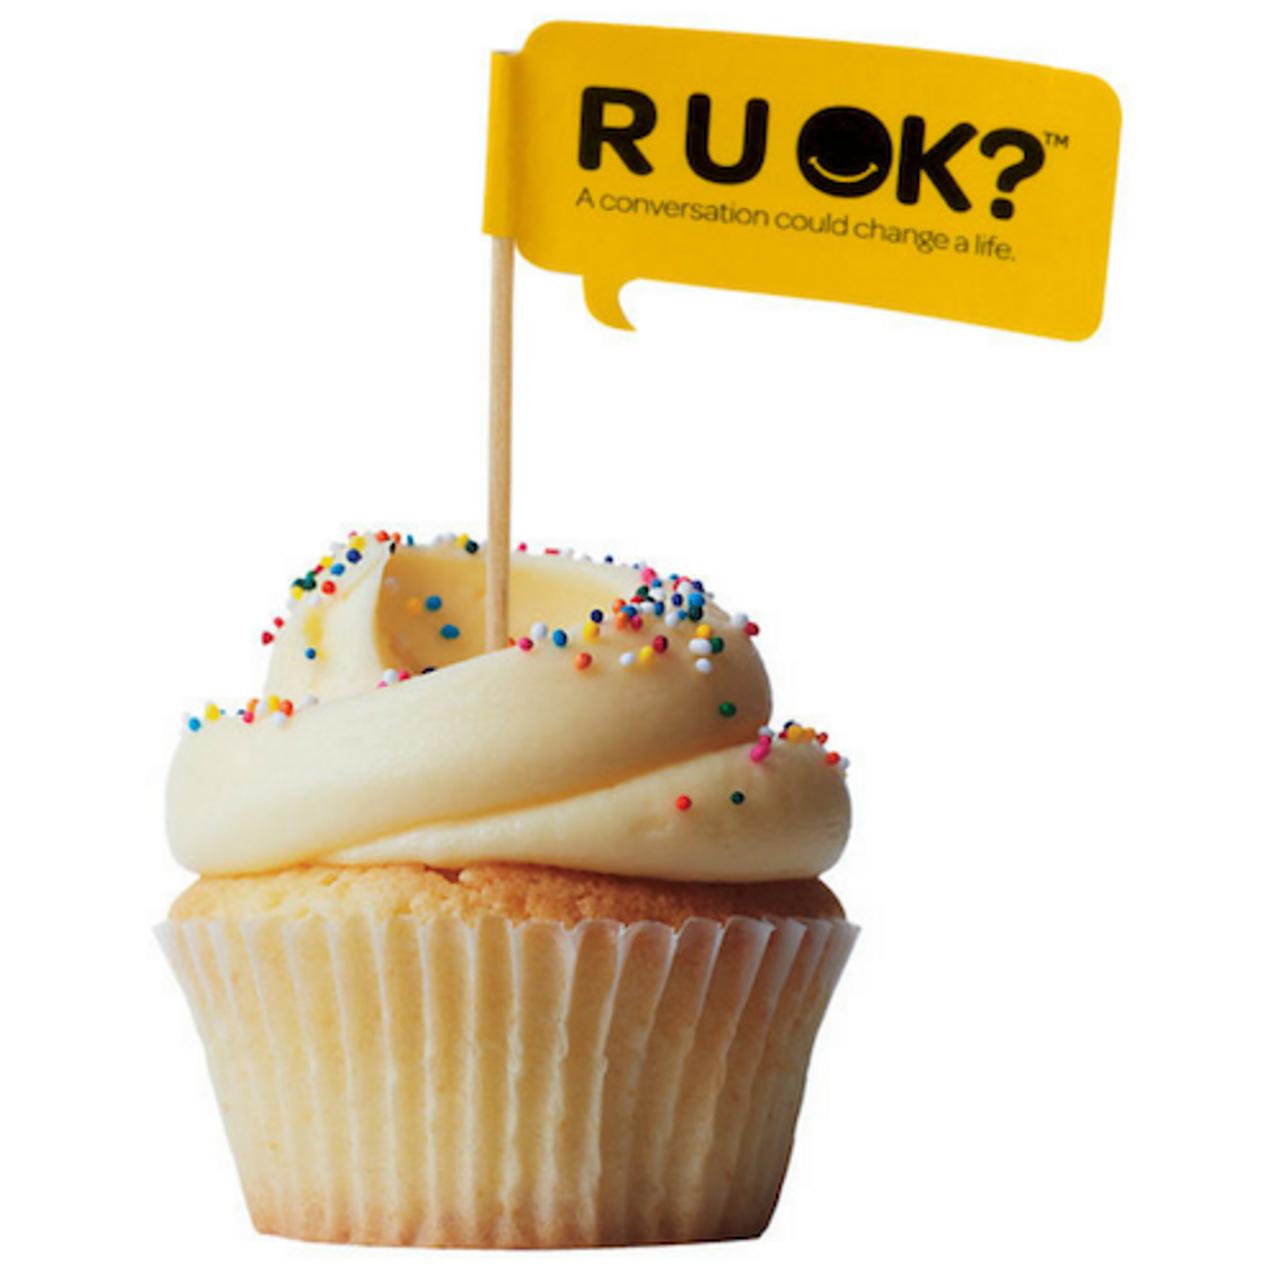 Cupcake Flags - R U OK? Merchandise